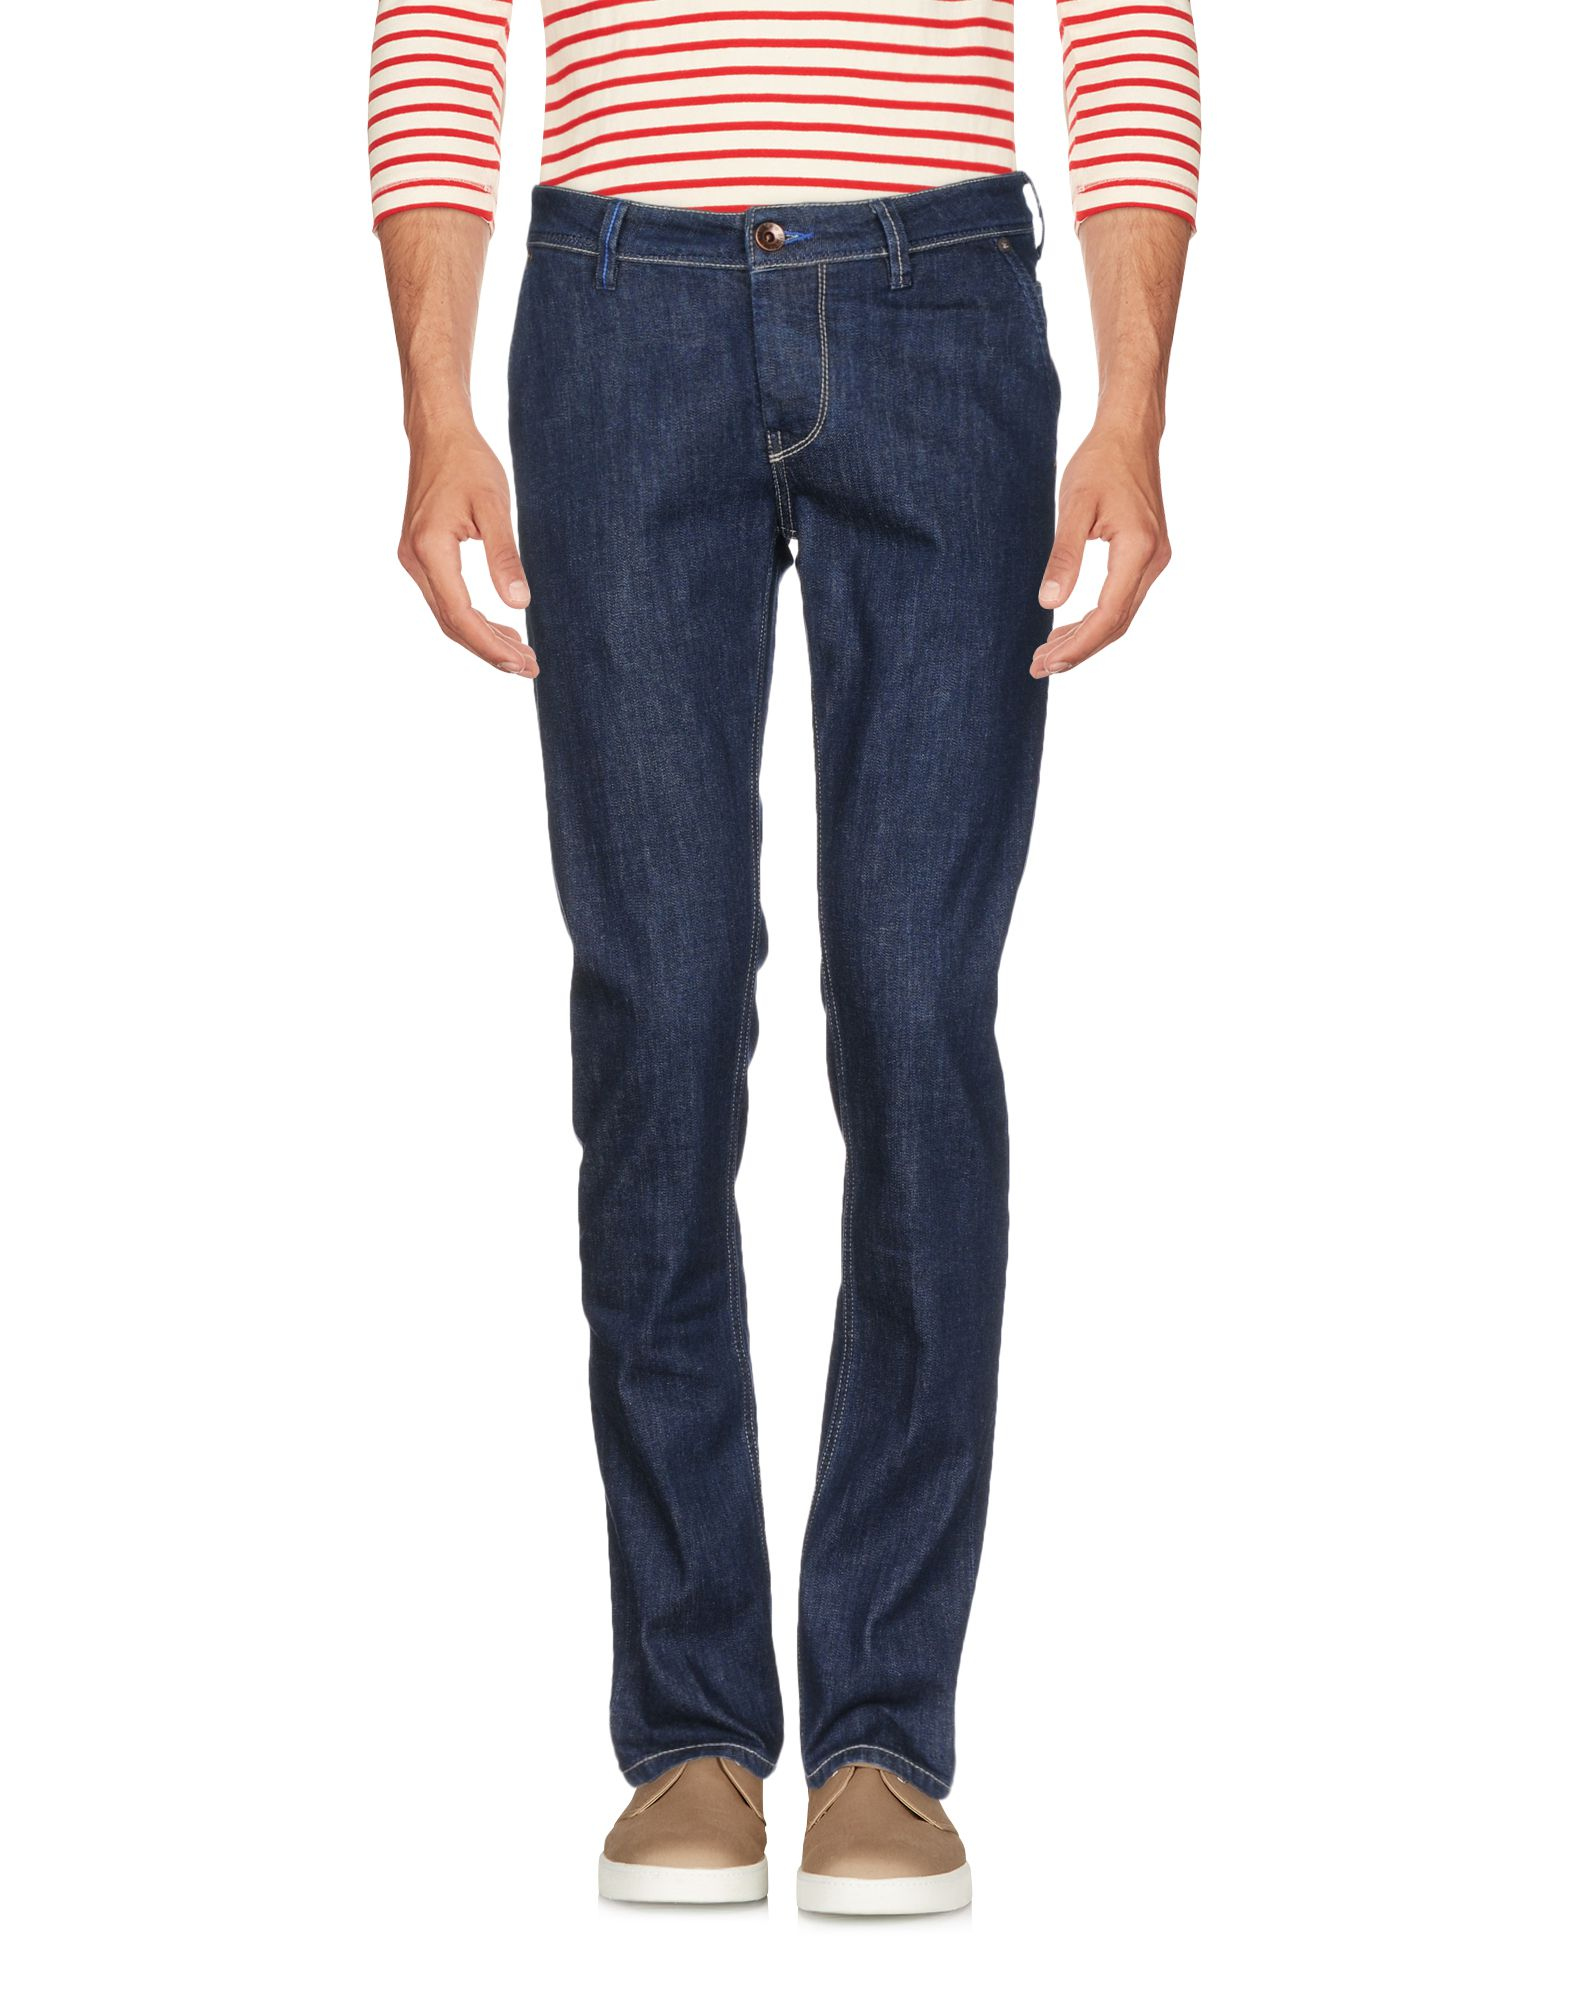 Jeans Uomo Hash Acquista su online Re Pantaloni twHdTw